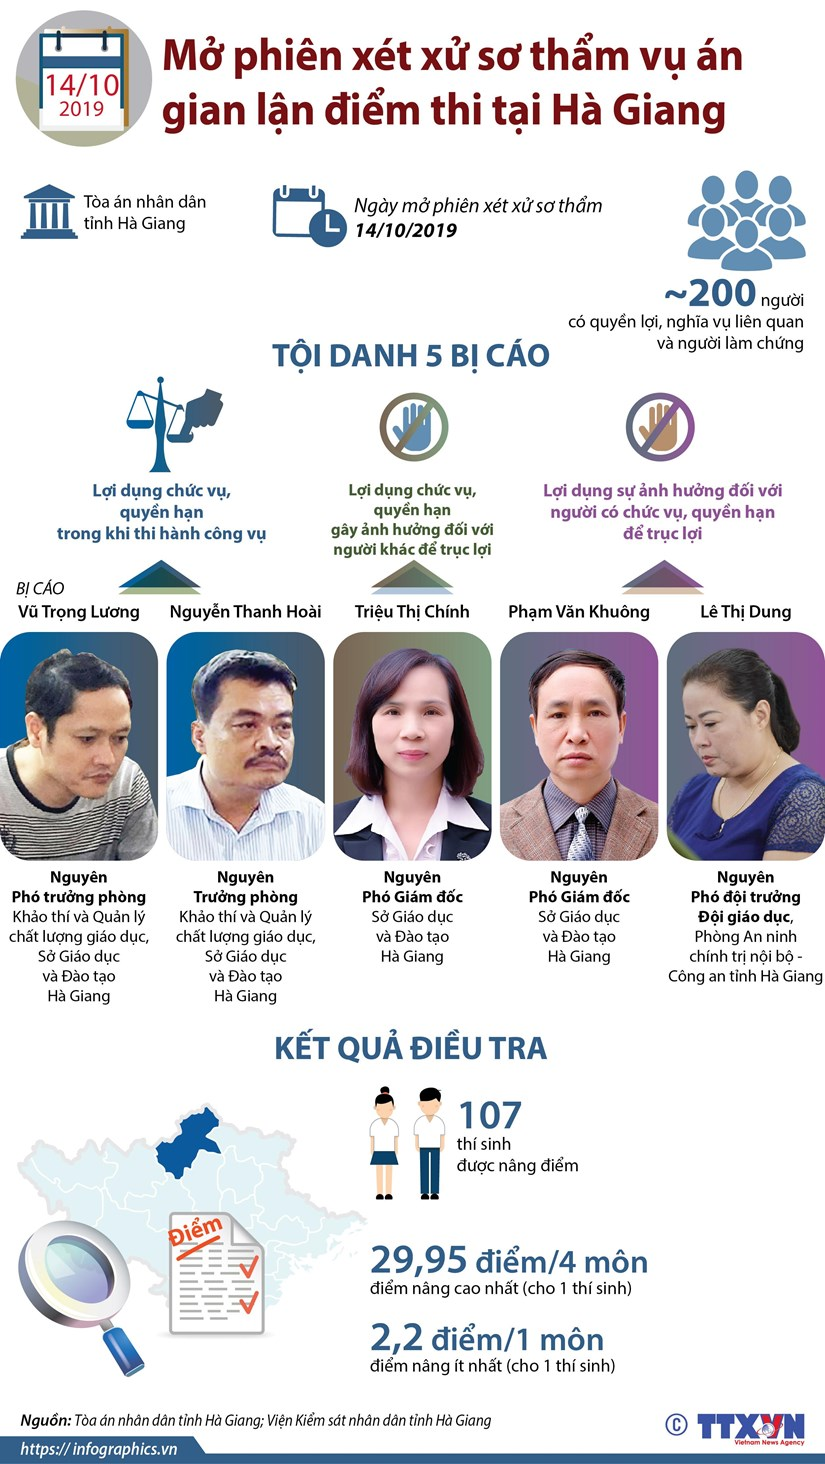 [Infographics] Xet xu so tham vu an gian lan diem thi tai Ha Giang hinh anh 1